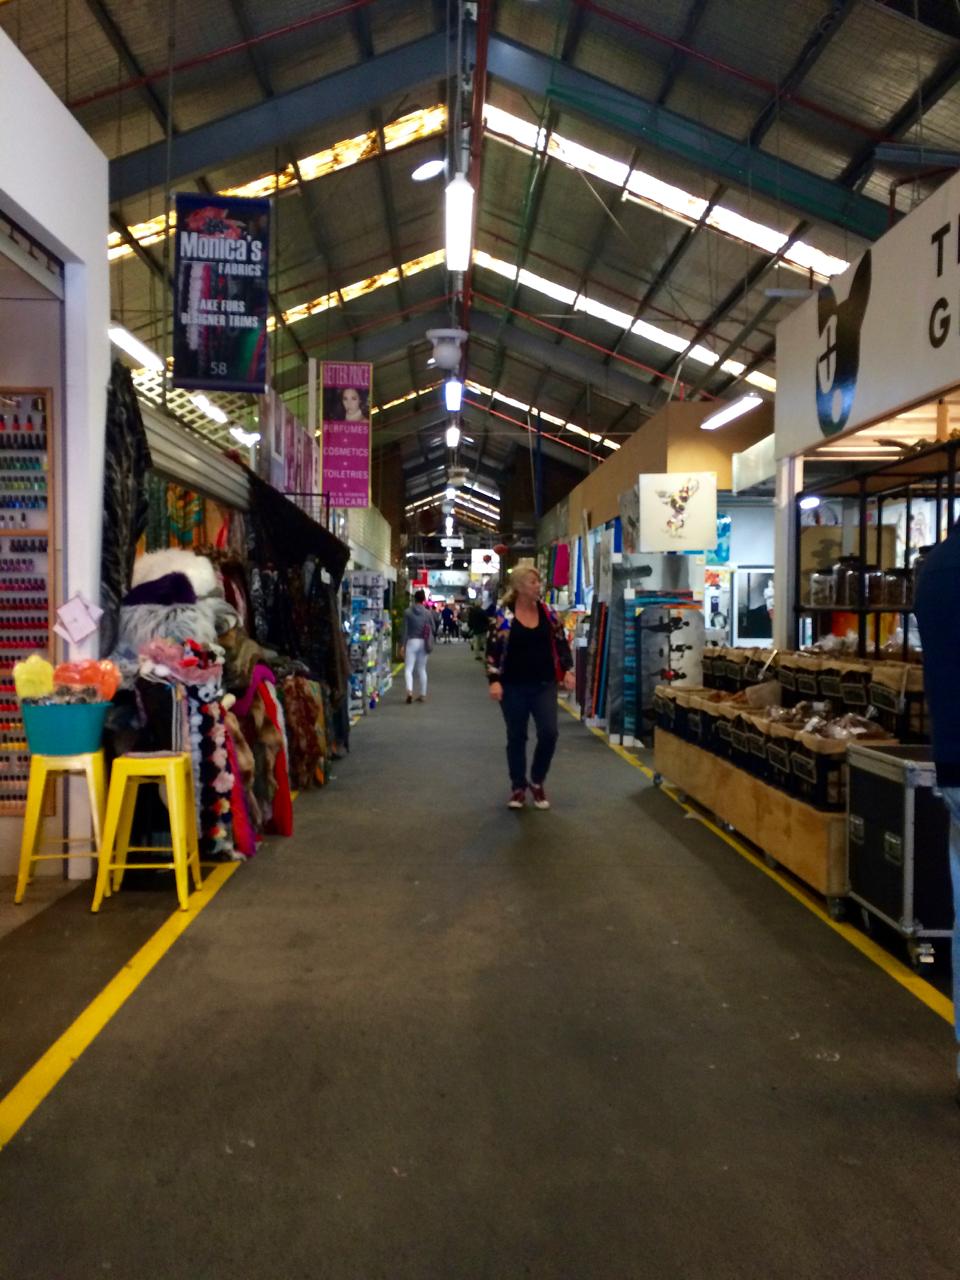 South Melbourne Market Melbourne, Australia